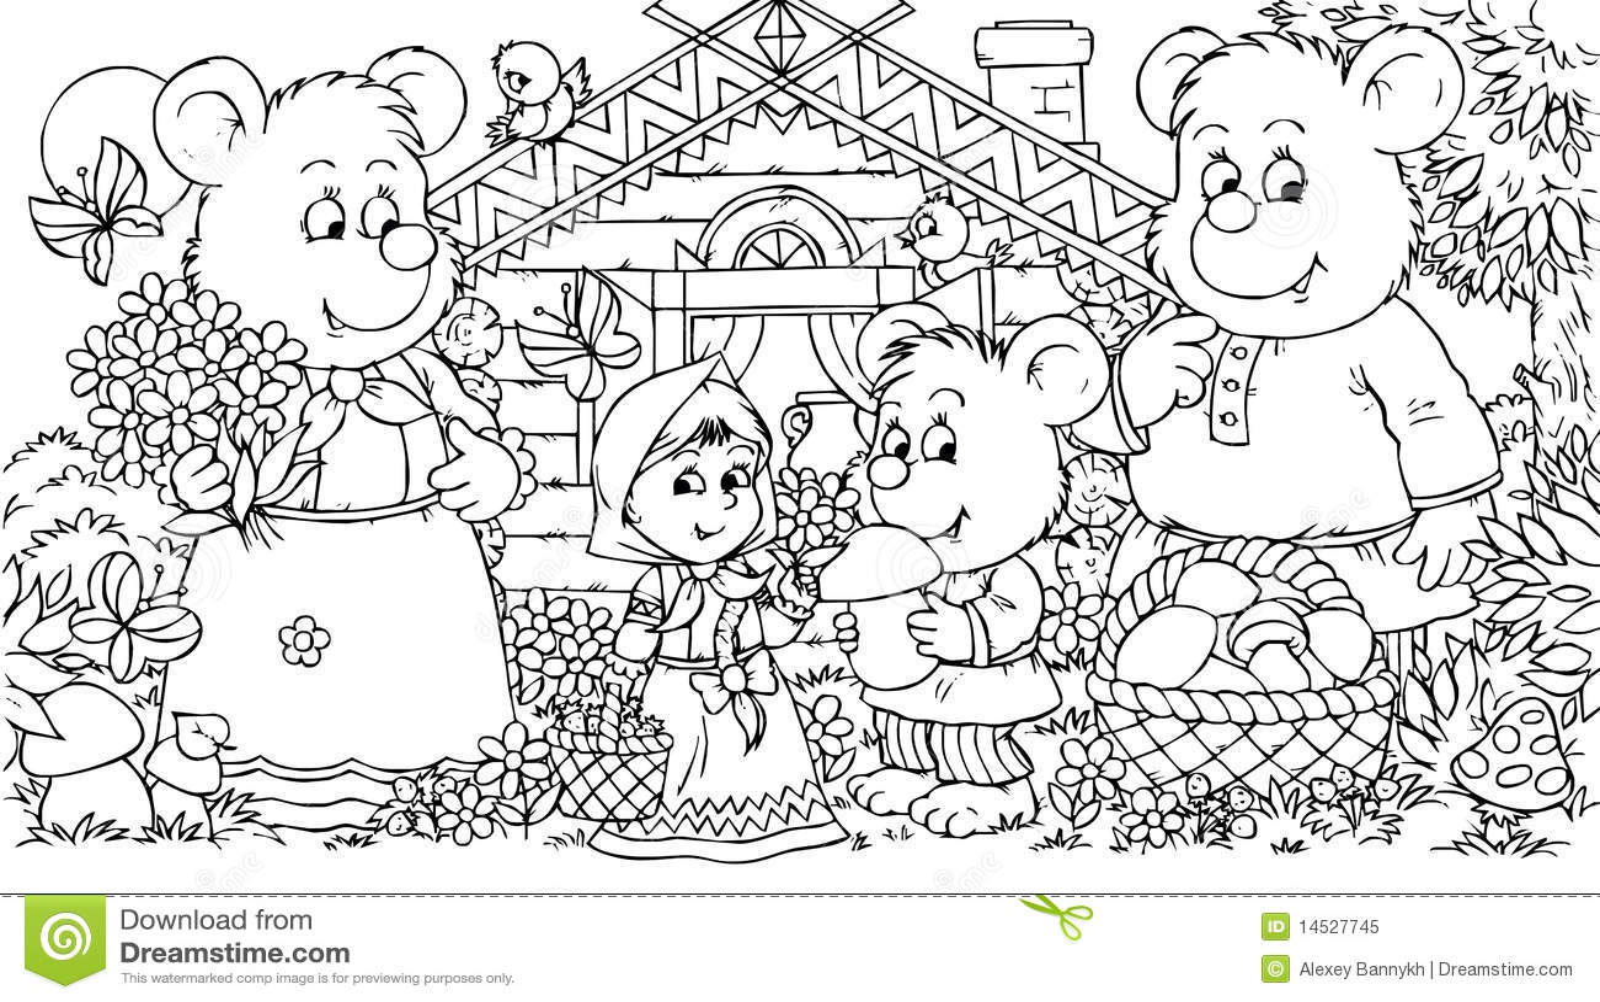 Three Bears And Little Girl Stock Illustration